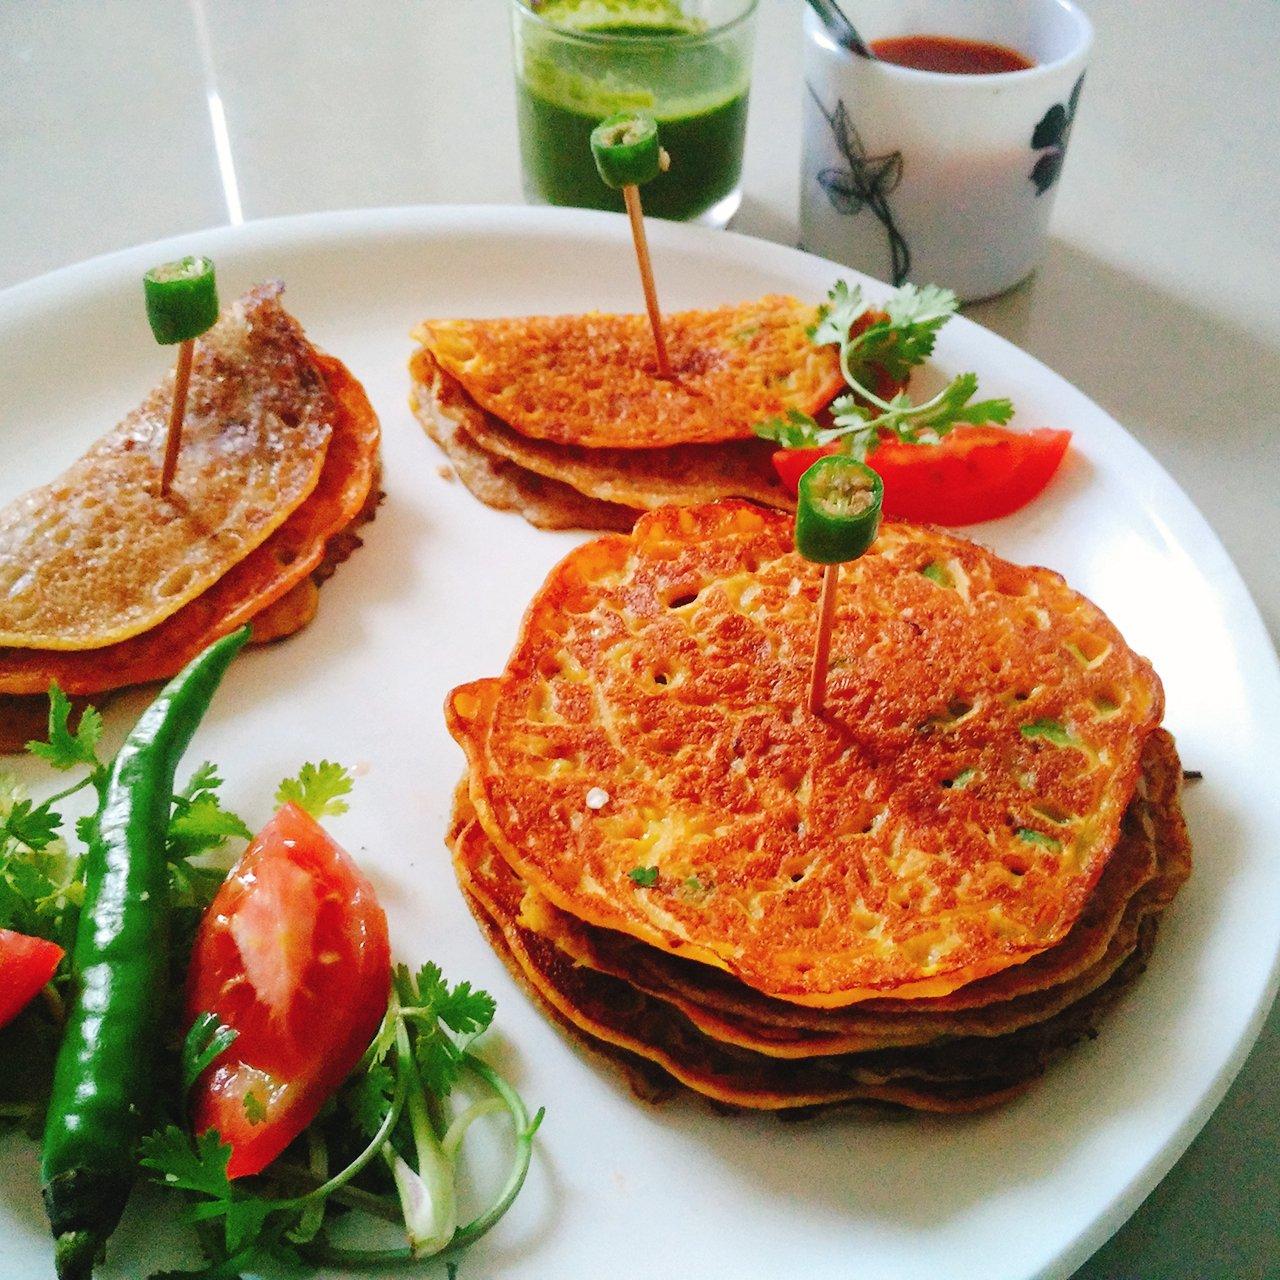 Khatta meetha pudla recipe gujarati style sweetish savoury pancake khatta meetha pudla recipe gujarati style sweetish savoury pancake forumfinder Choice Image